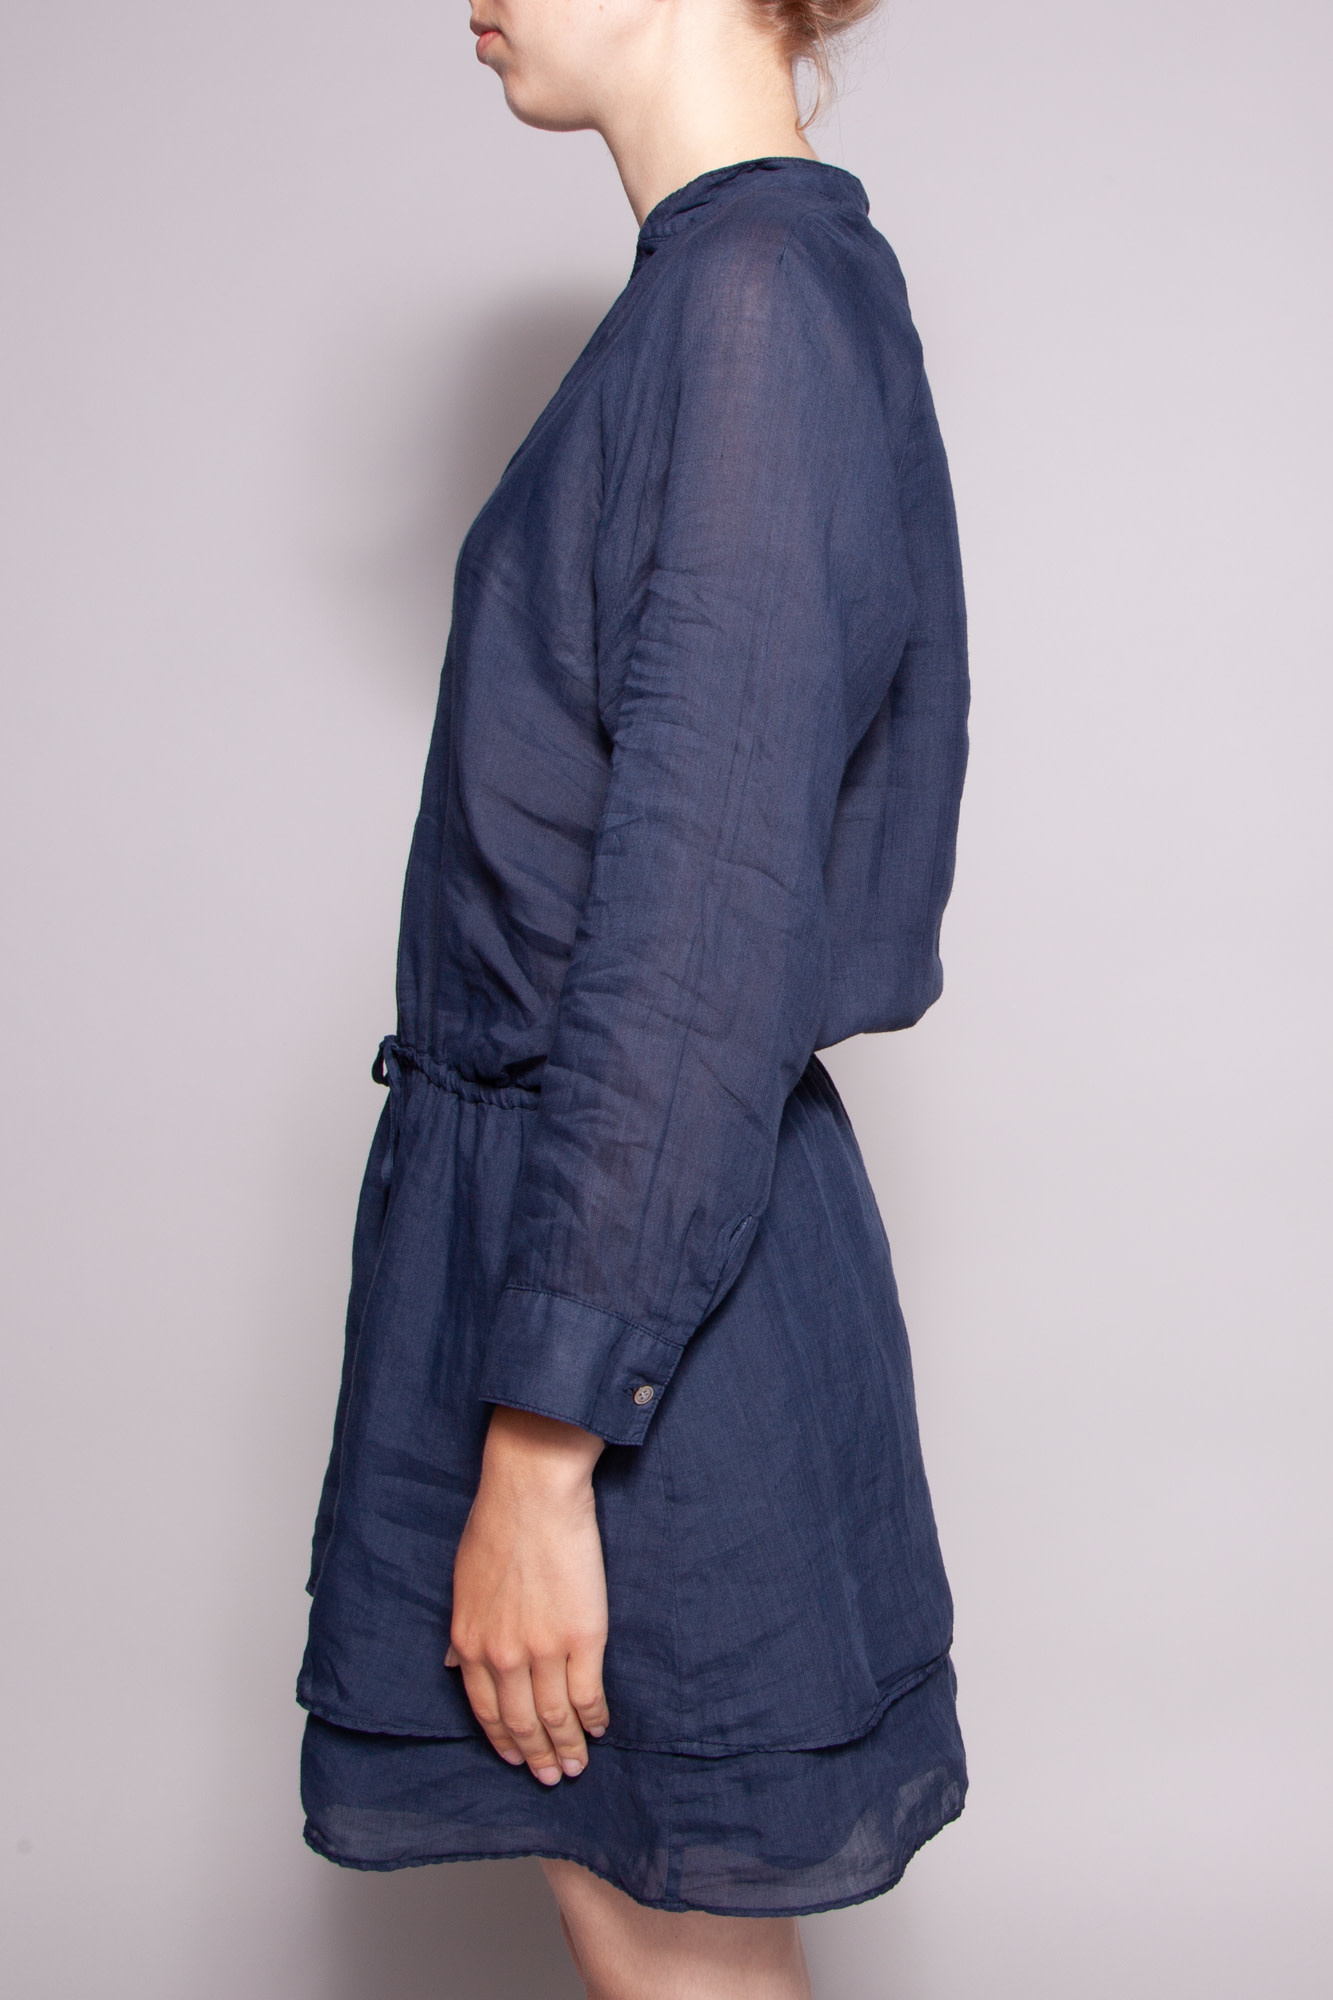 Theory NEW PRICE (WAS $110) - SHEER DARK BLUE RAMIE DRESS TUNIC